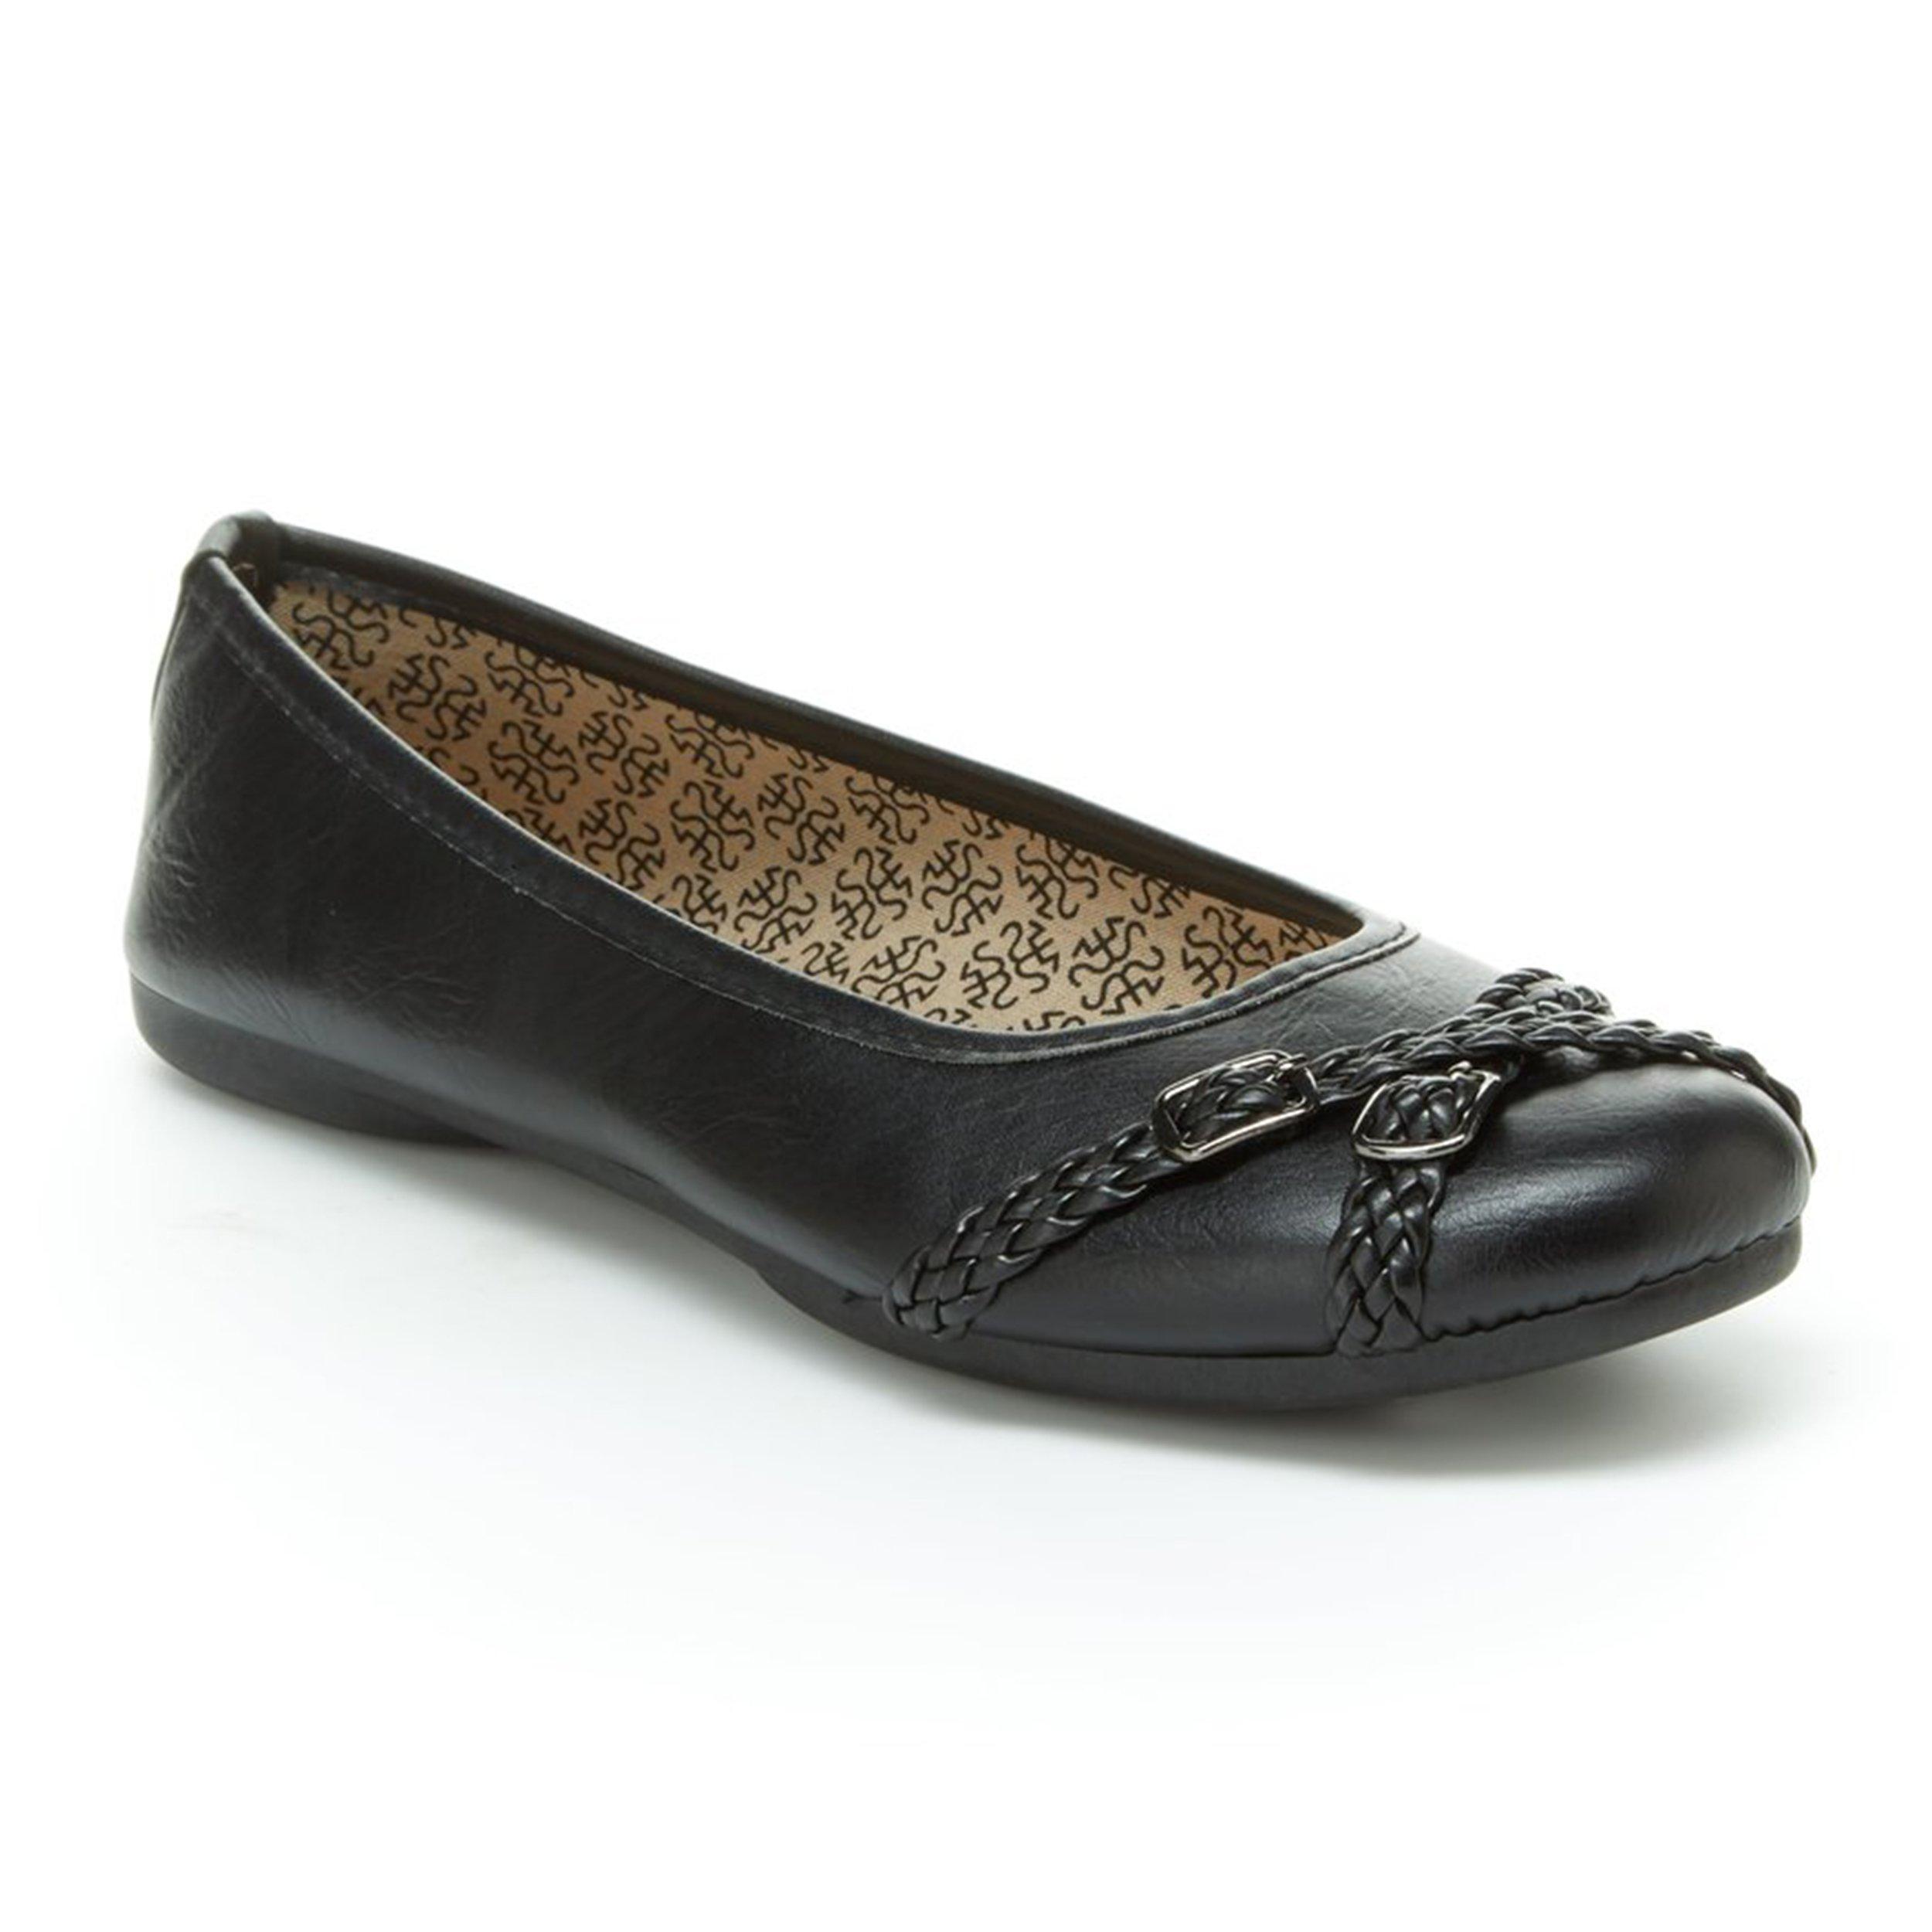 Harborsides Gwen Women Comfort Flats, Memory Foam Insole, Flex A Lite Outsole